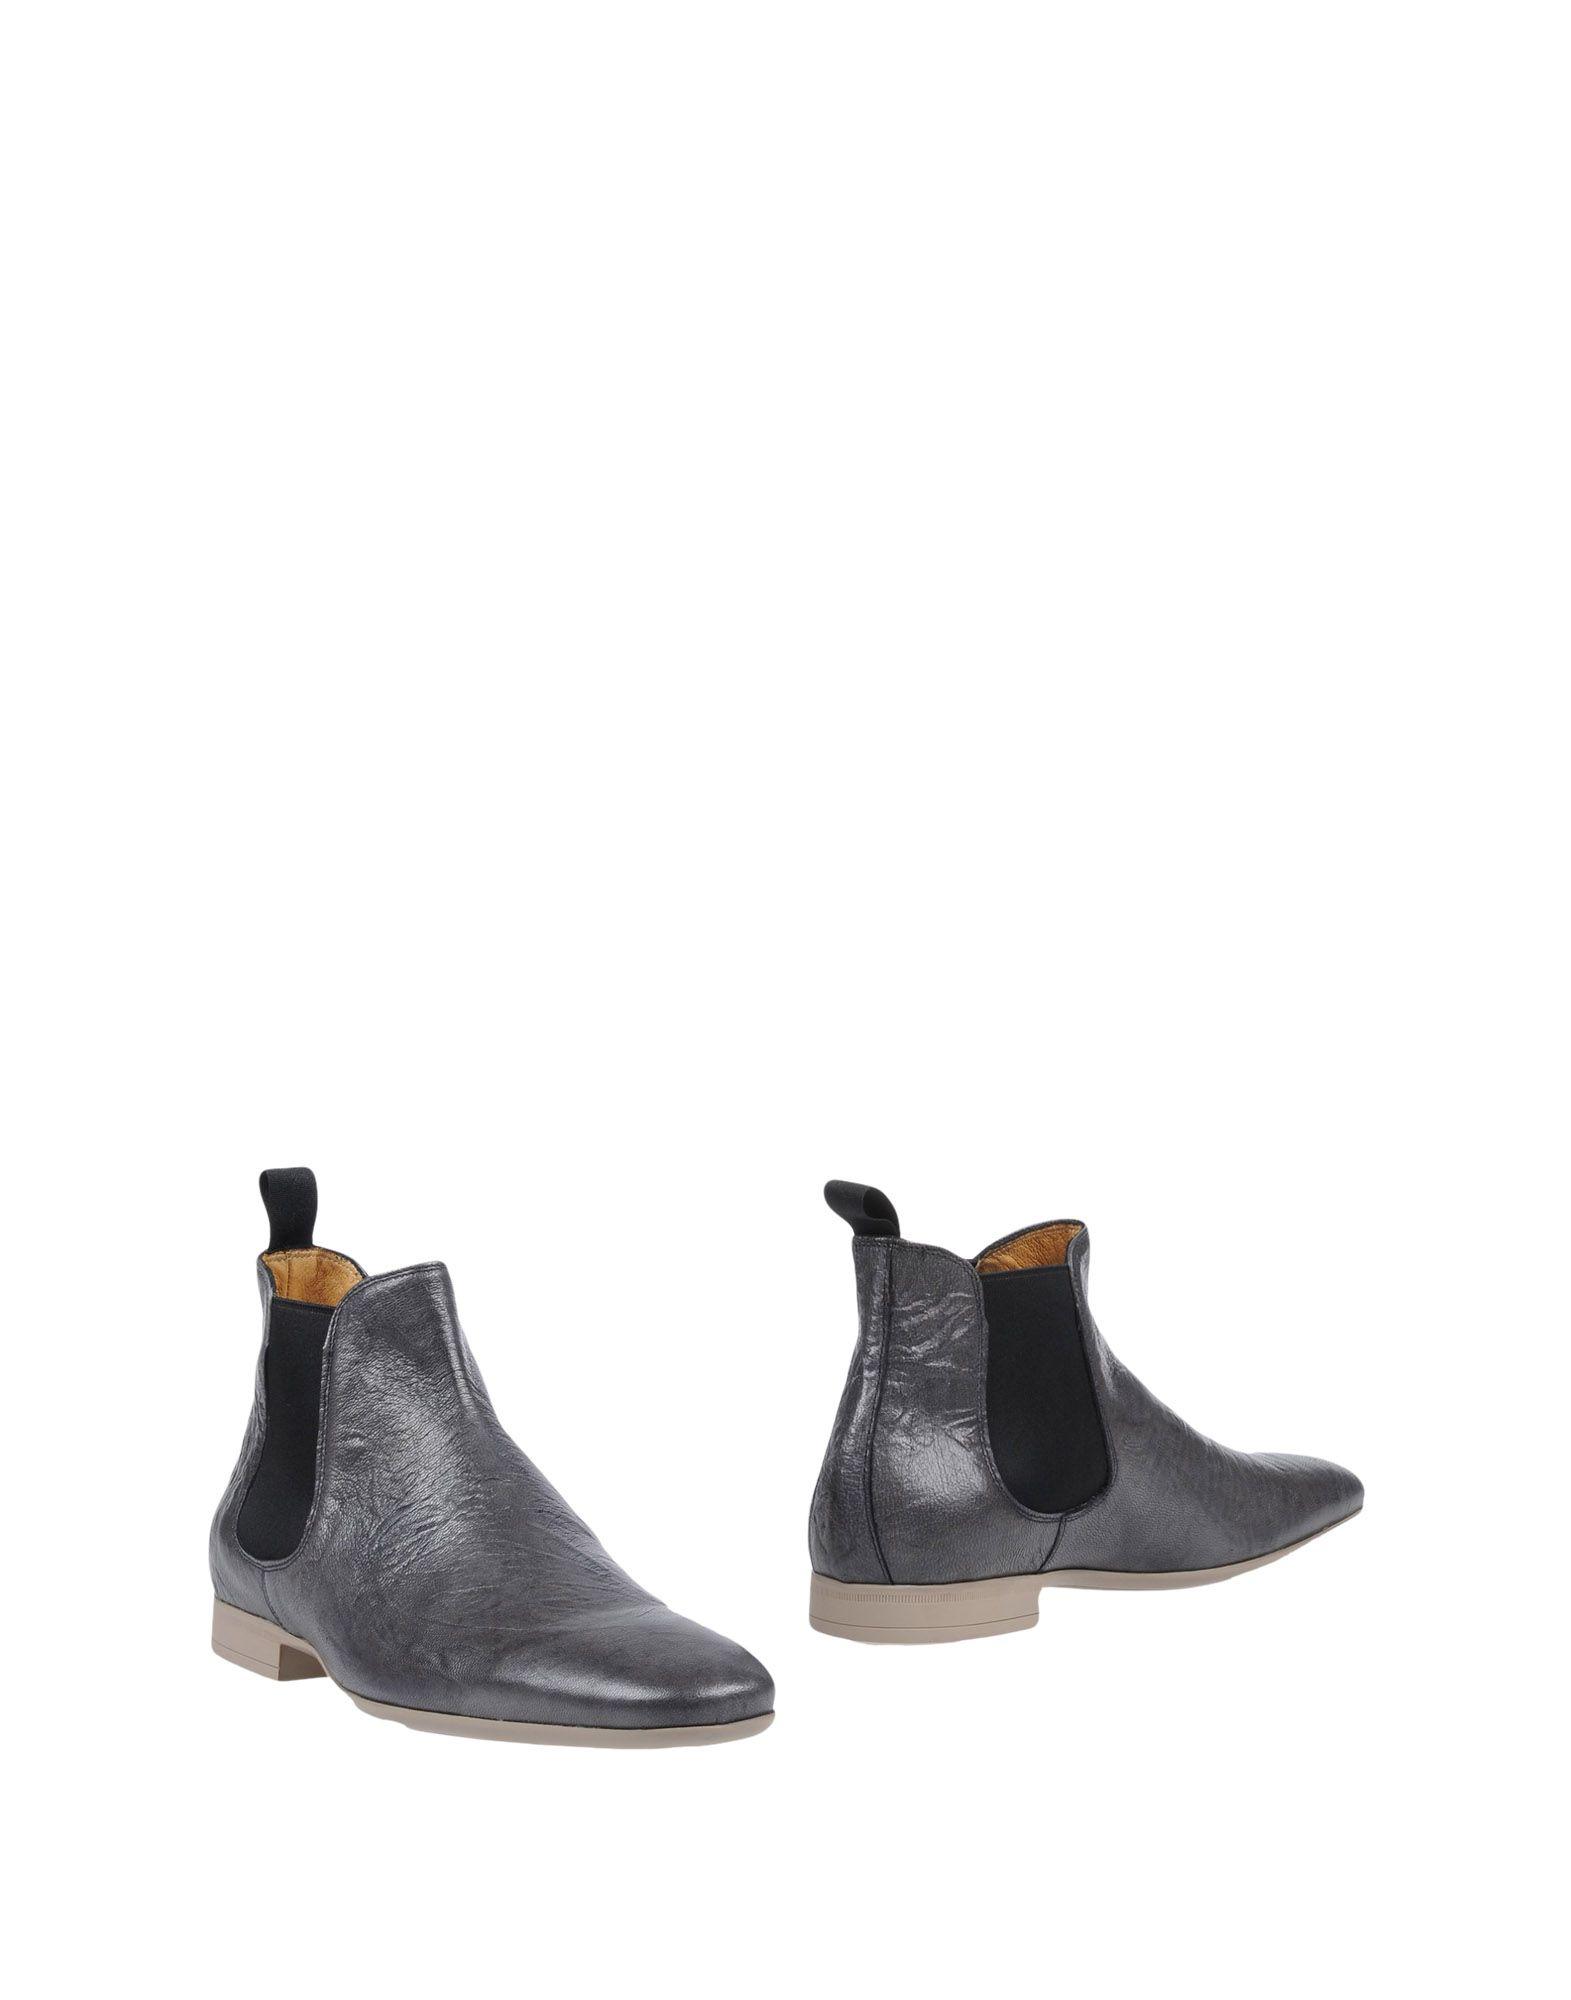 Rabatt echte Schuhe Profession: Bottier Stiefelette Herren  11437793LU